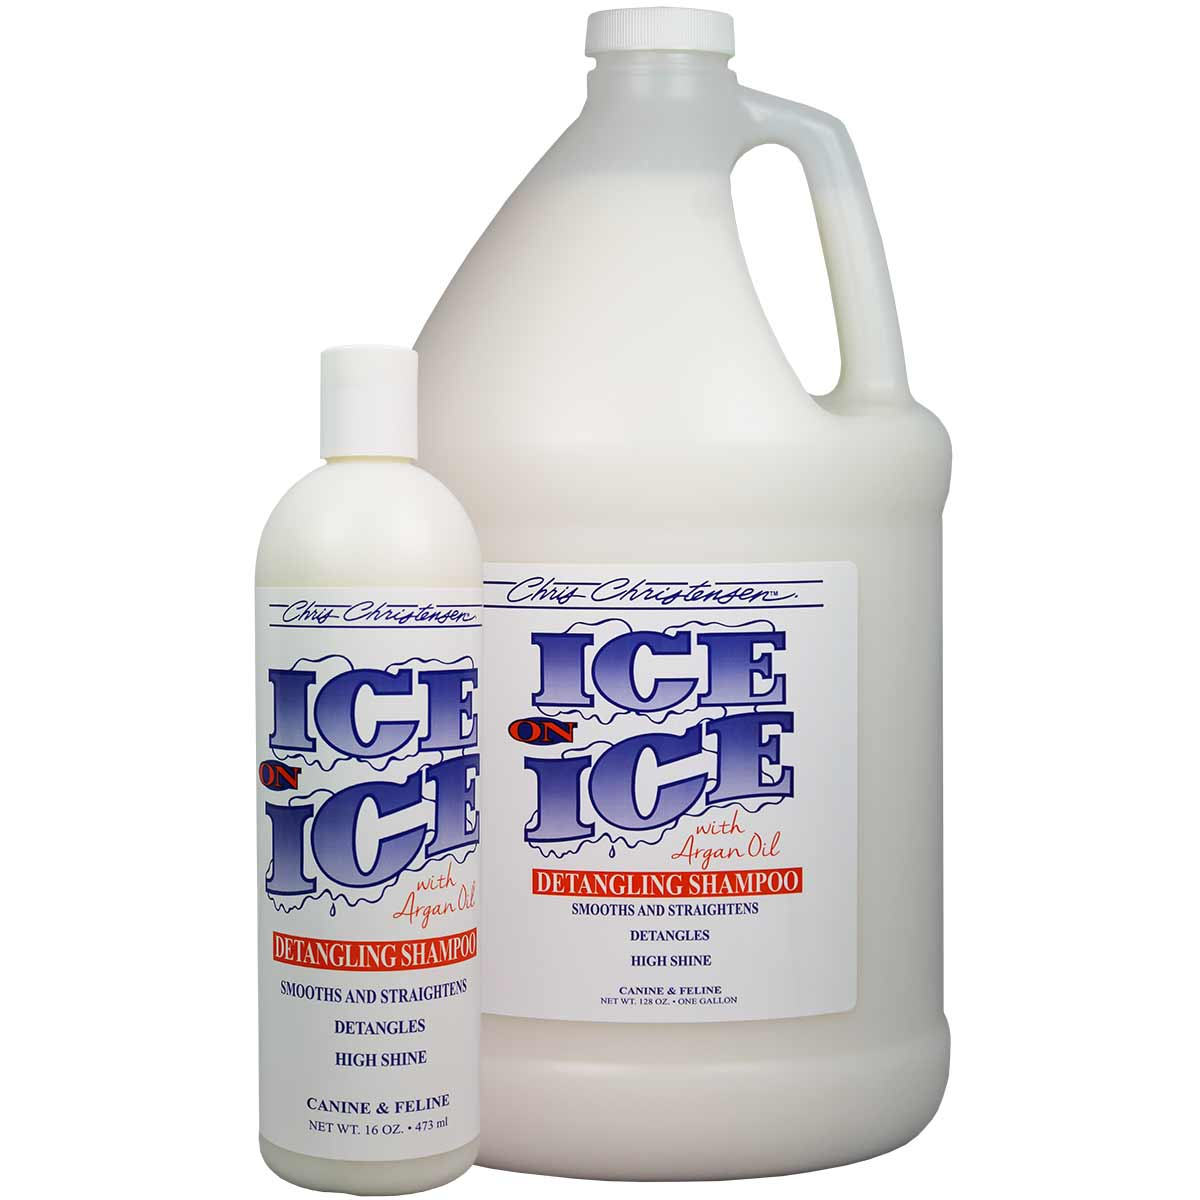 Chris Christensen Ice on Ice Detangling Pet Shampoo